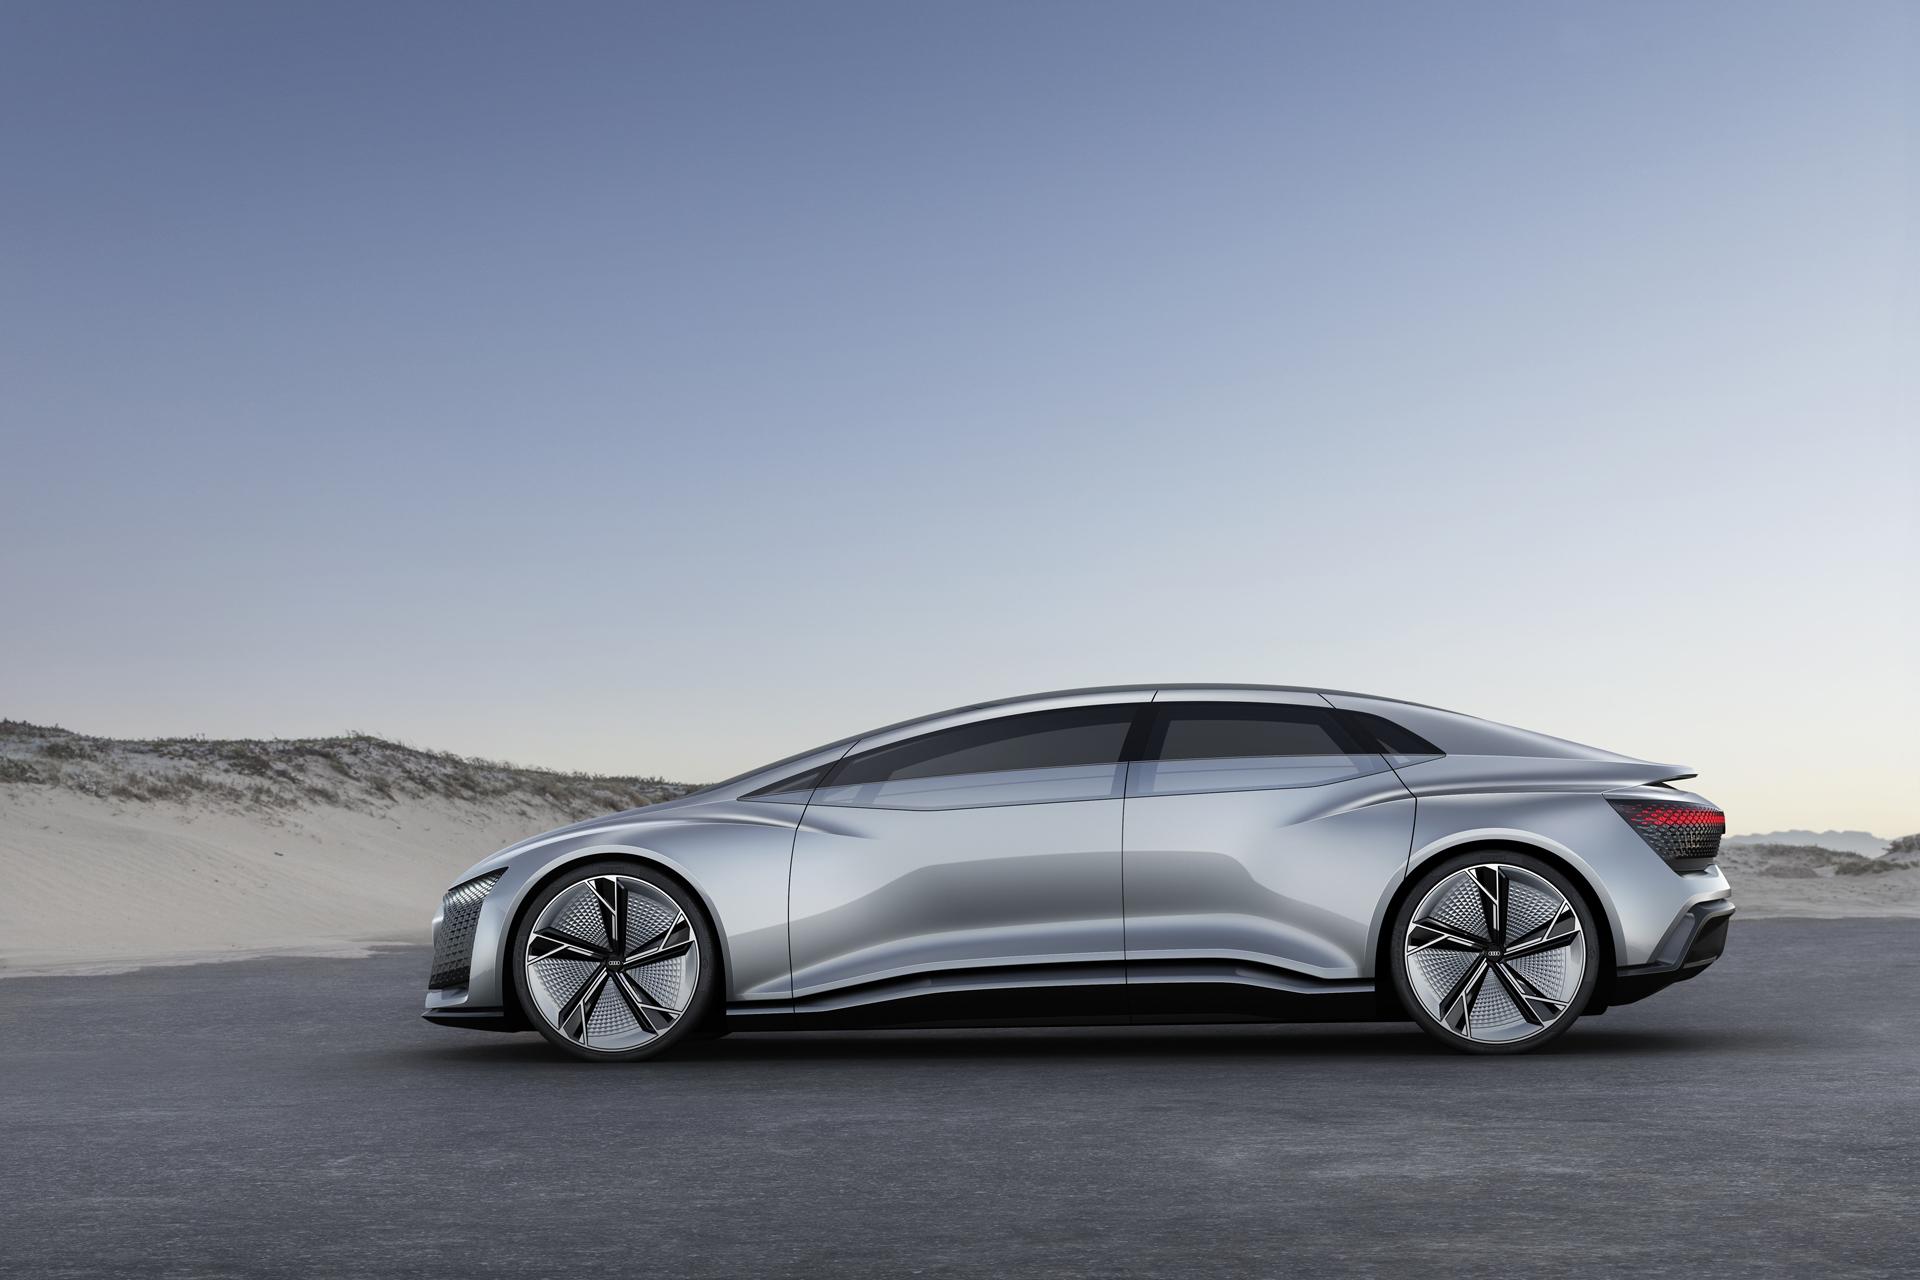 Jaguar I-Pace road trip, Subaru Forester hybrid, Porsche Taycan sold